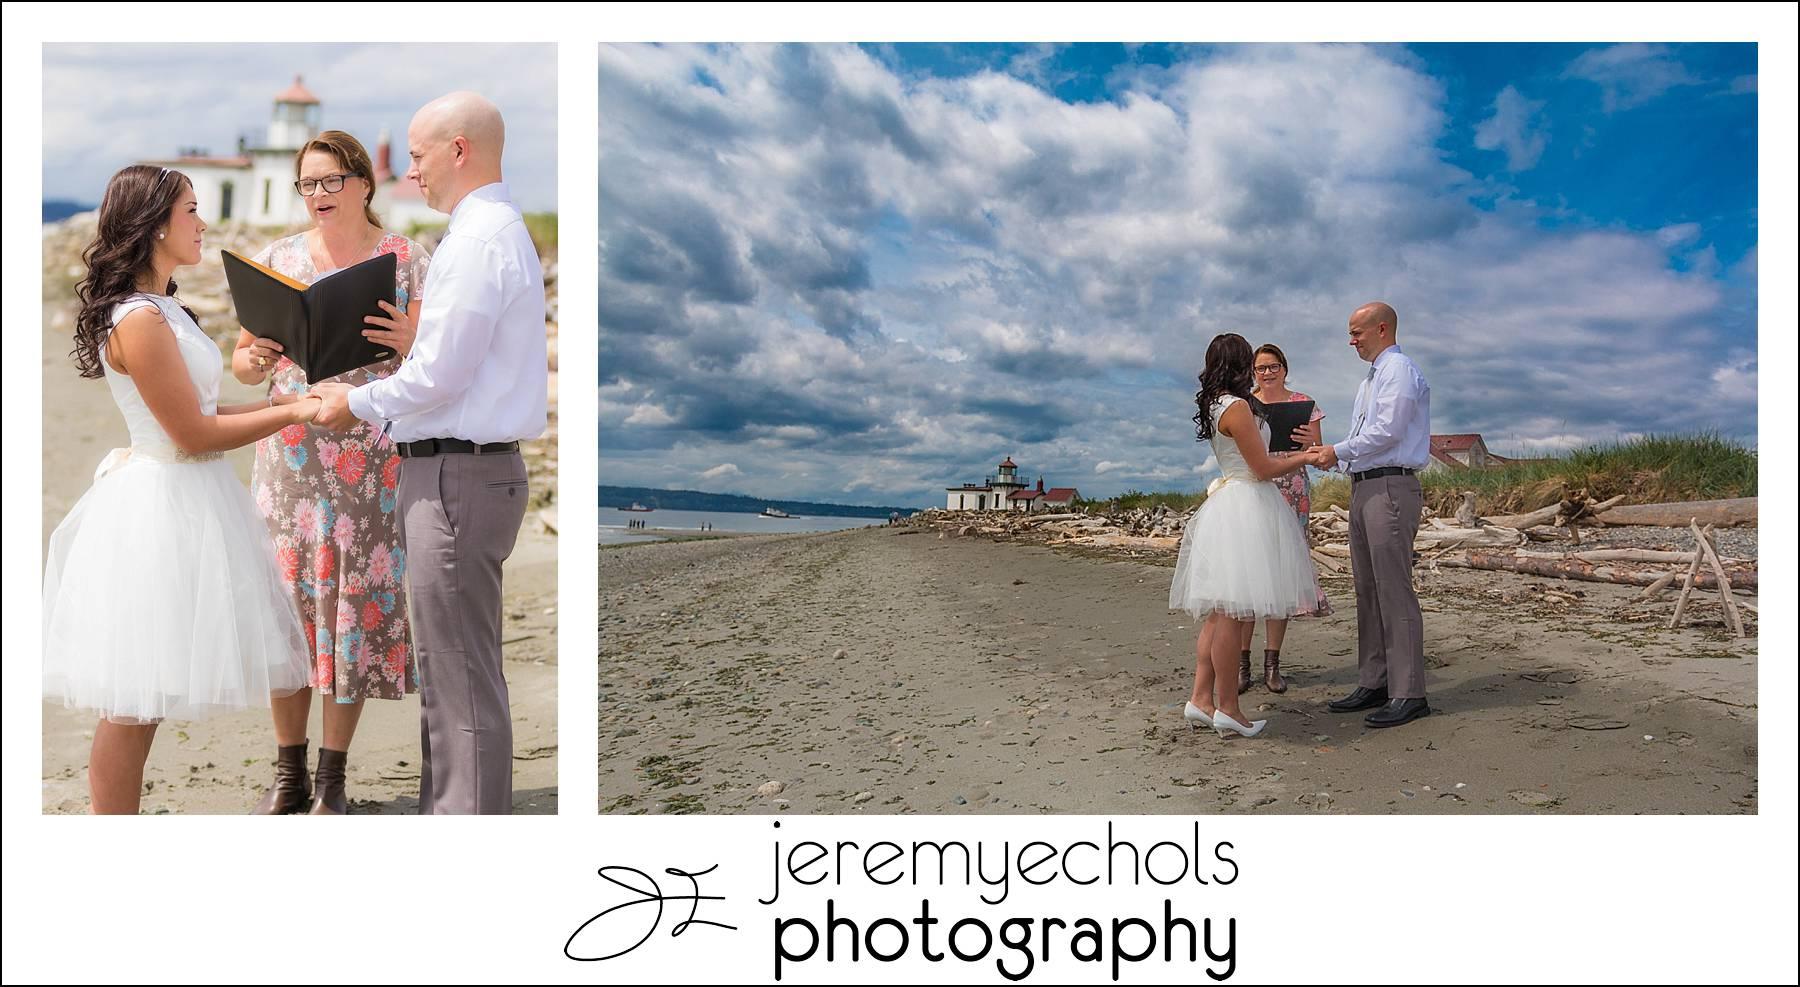 Drew-Erica-Discovery-Park-Wedding-0017_WEB.jpg